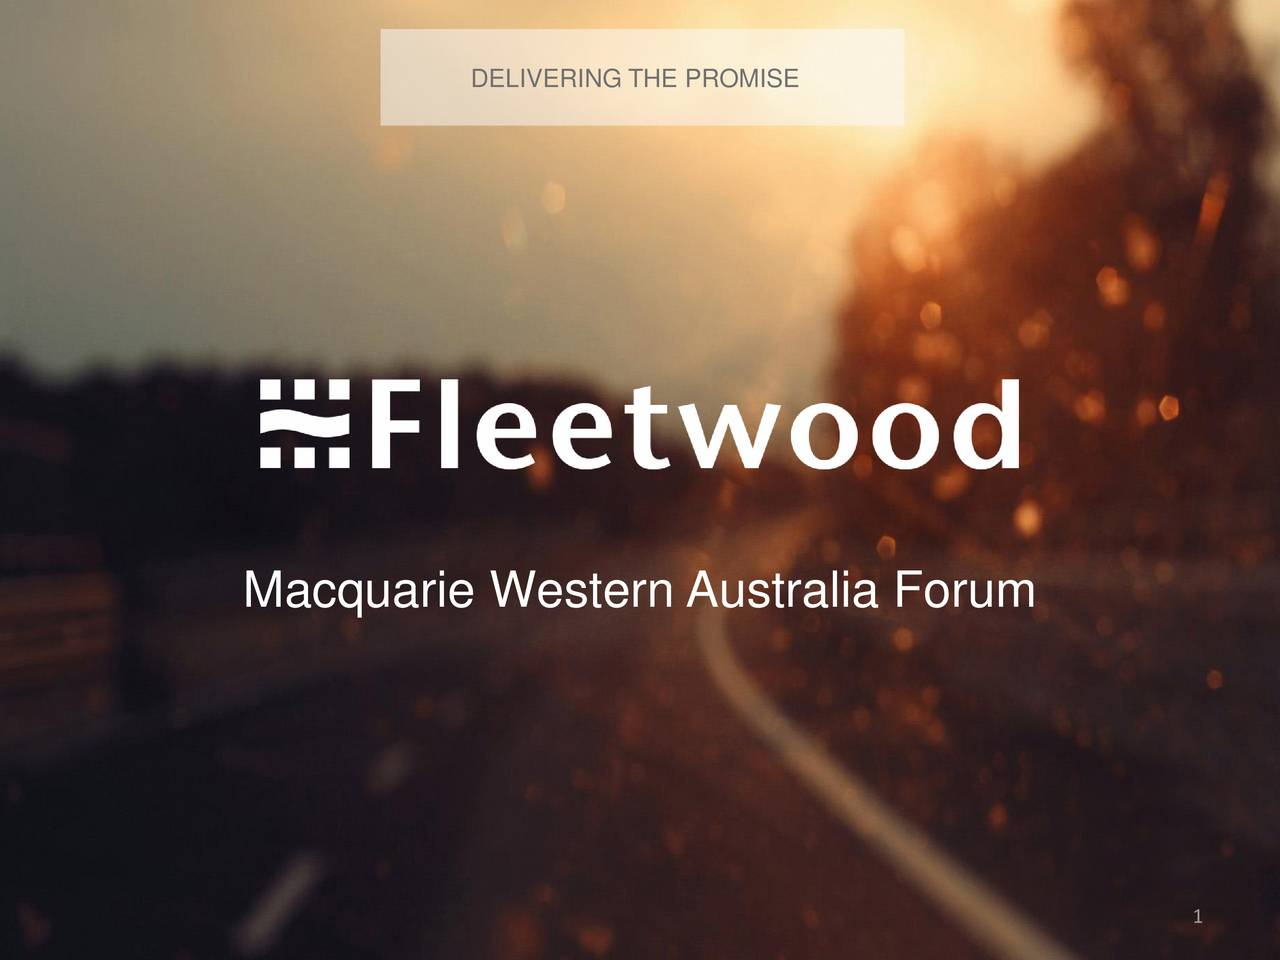 Fleetwood Corporation (FLWLF) Presents At WA Forum